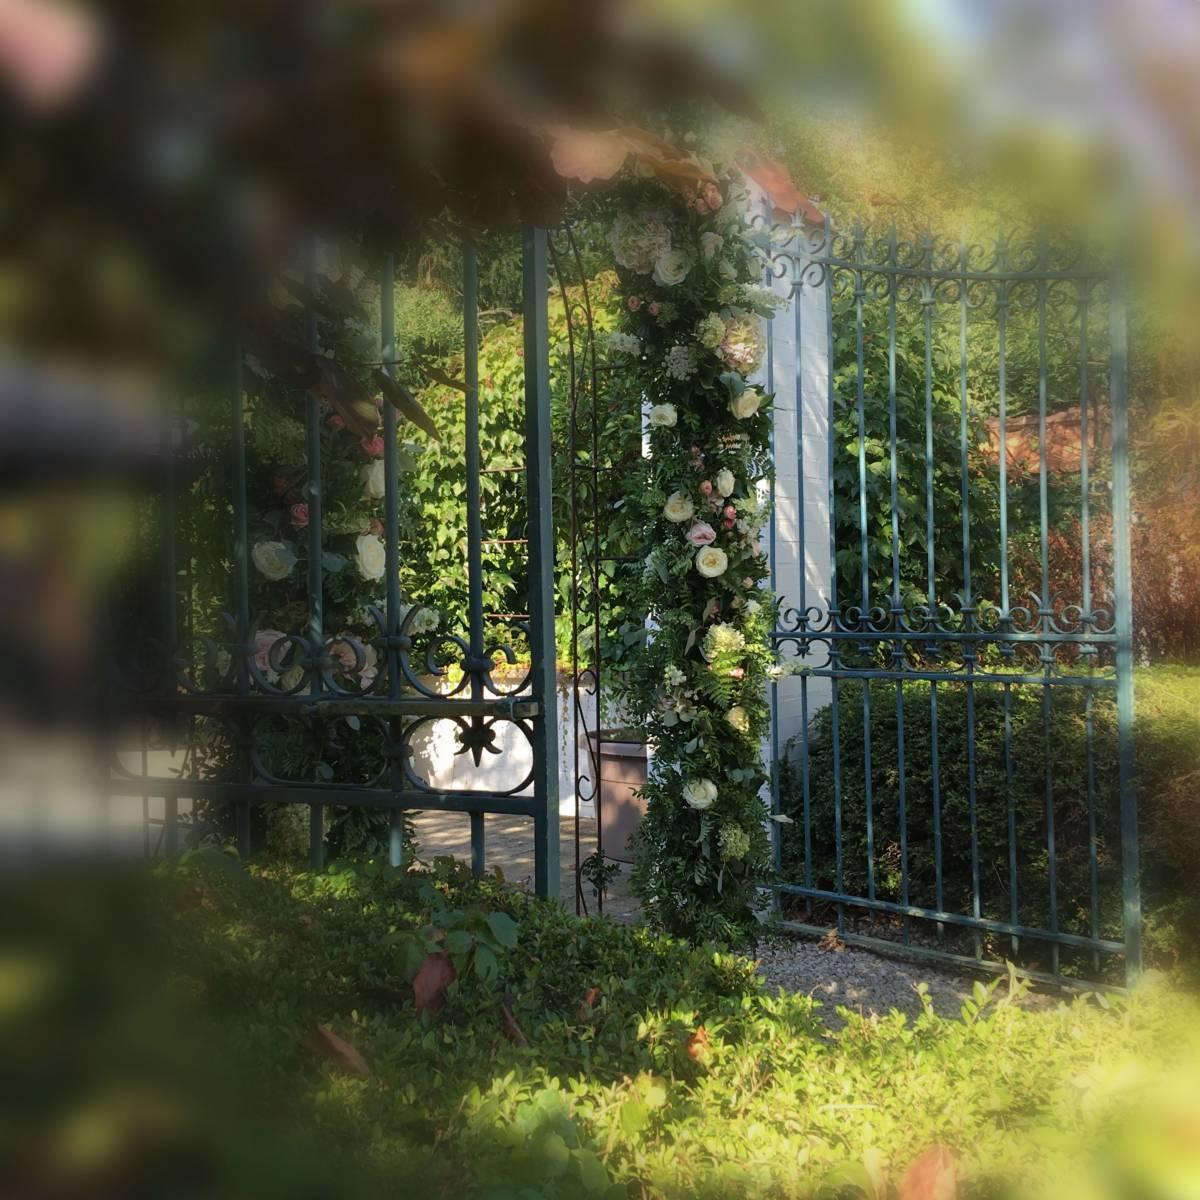 Maison Fleurie - Fotograaf zelfgetrokken - House of Weddings - 18